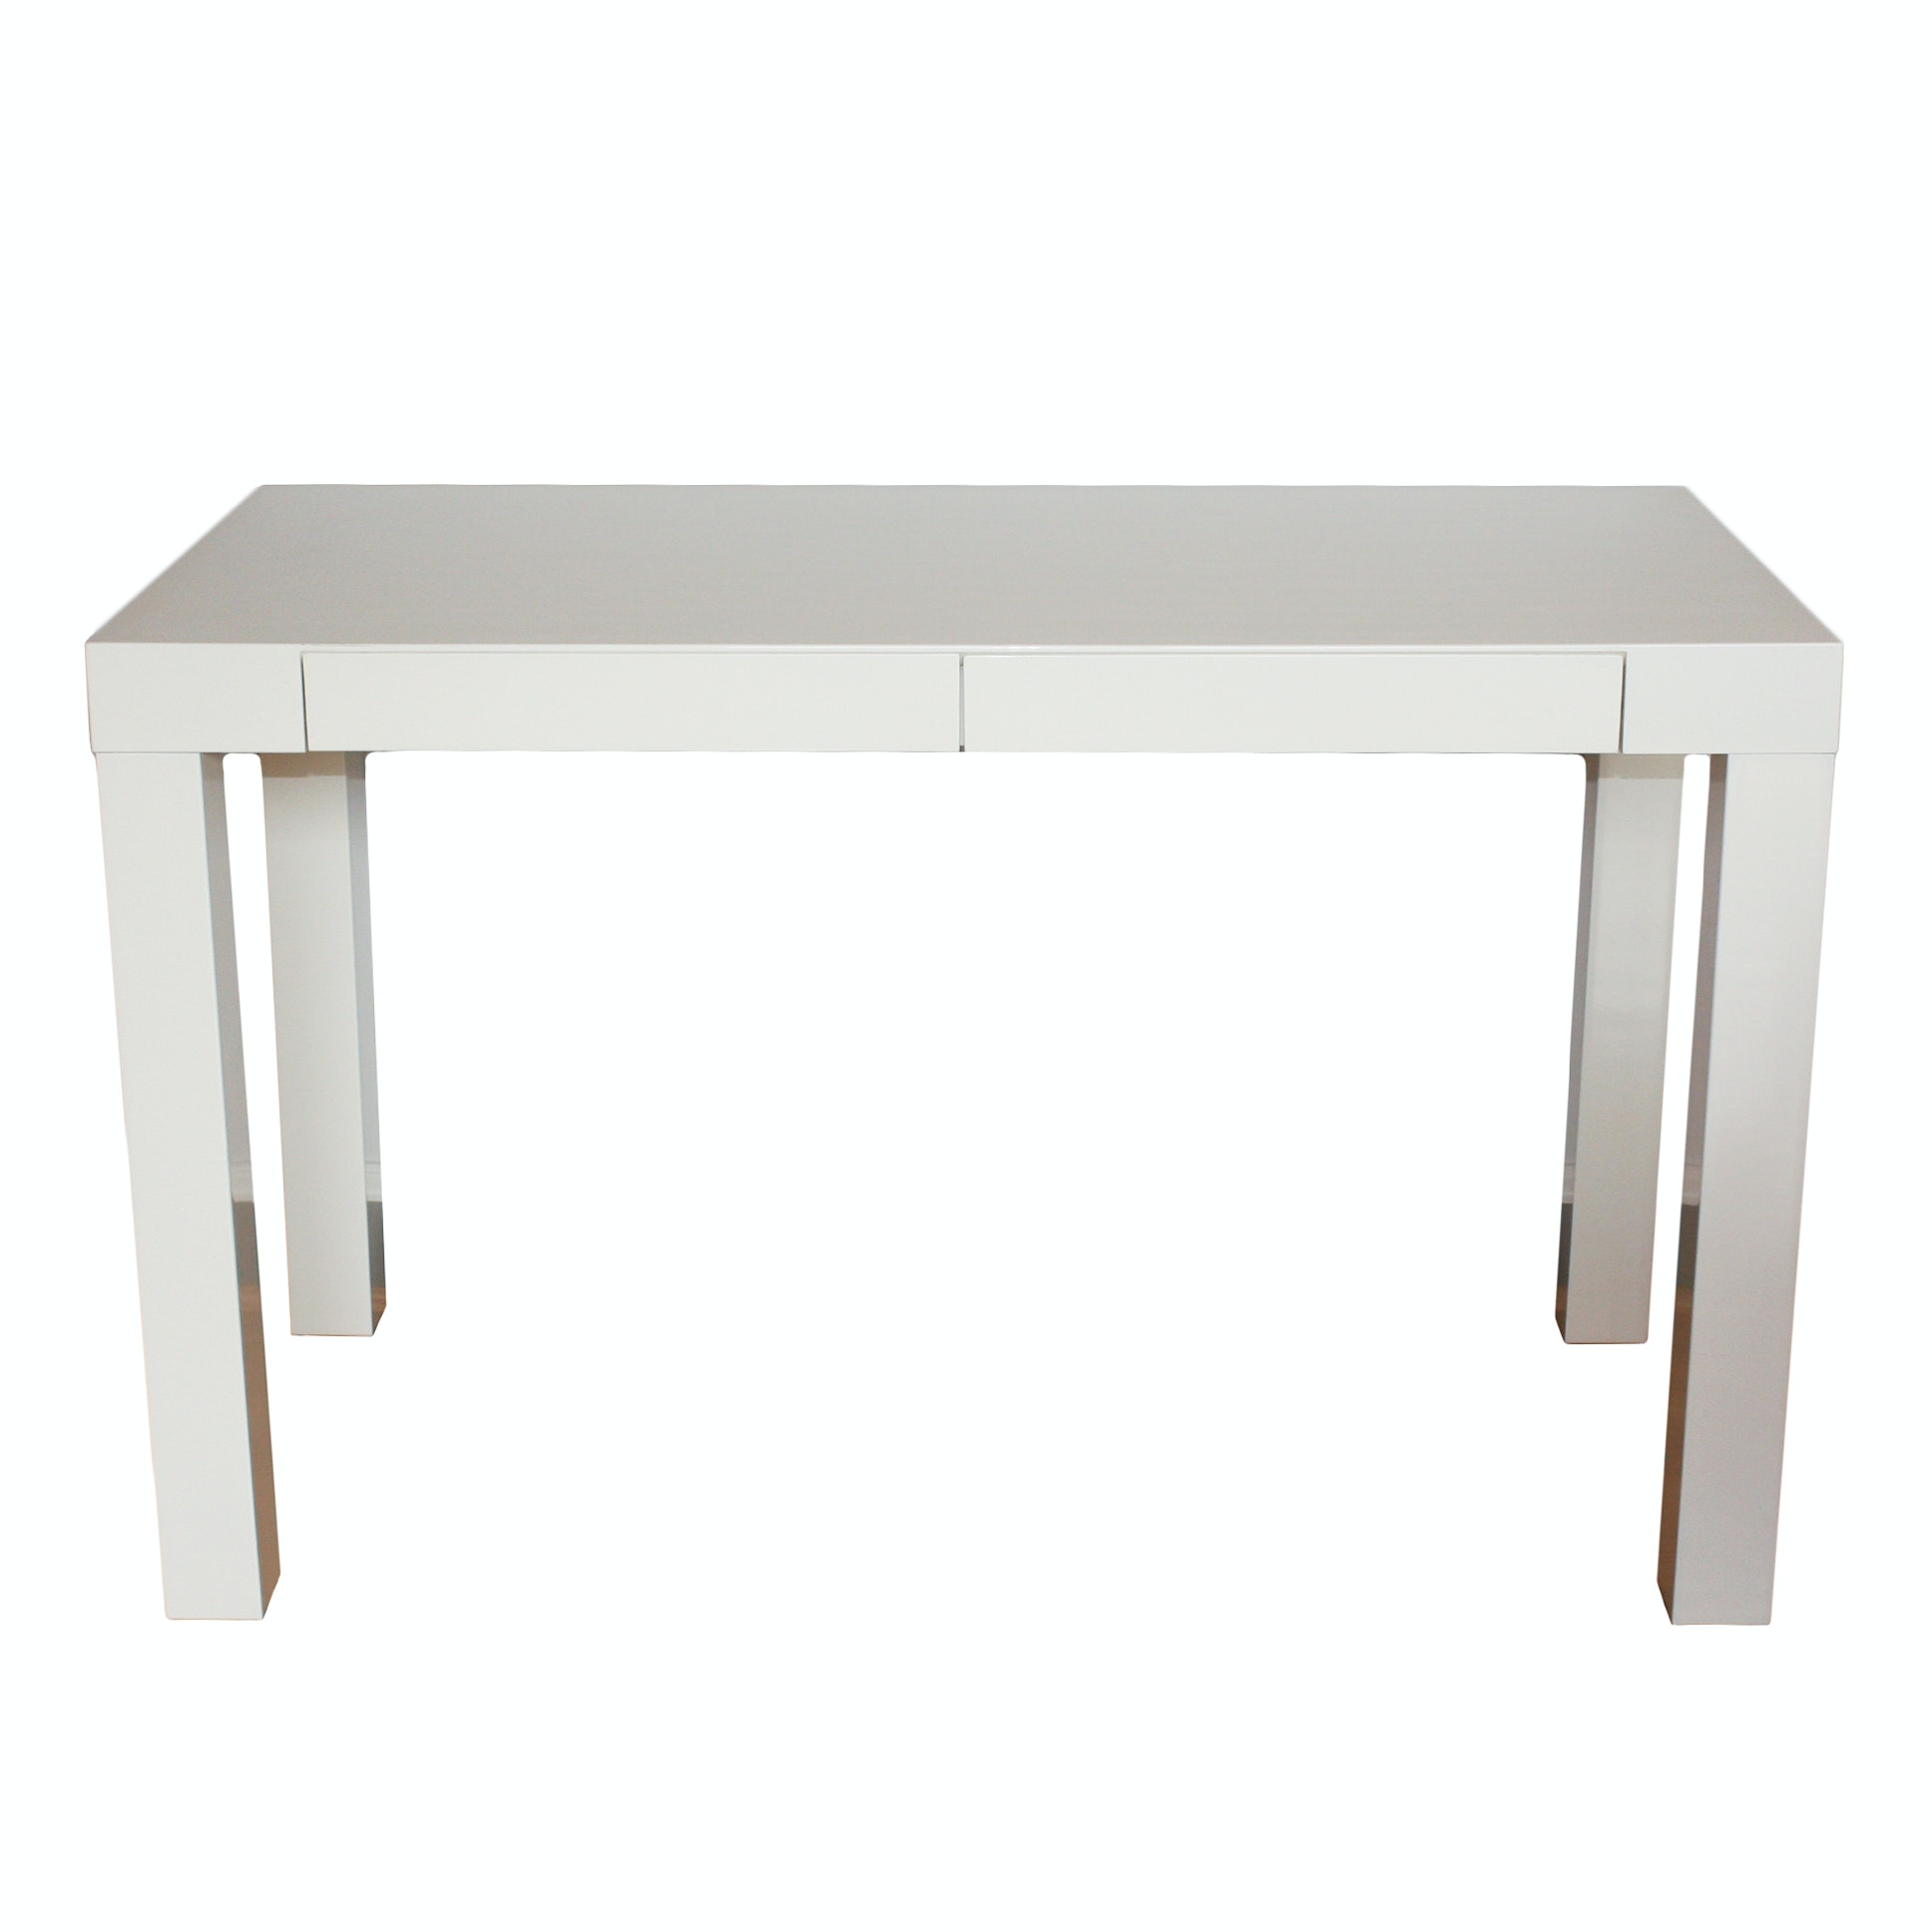 Great West Elm Modern Parsons Desk ... Amazing Design